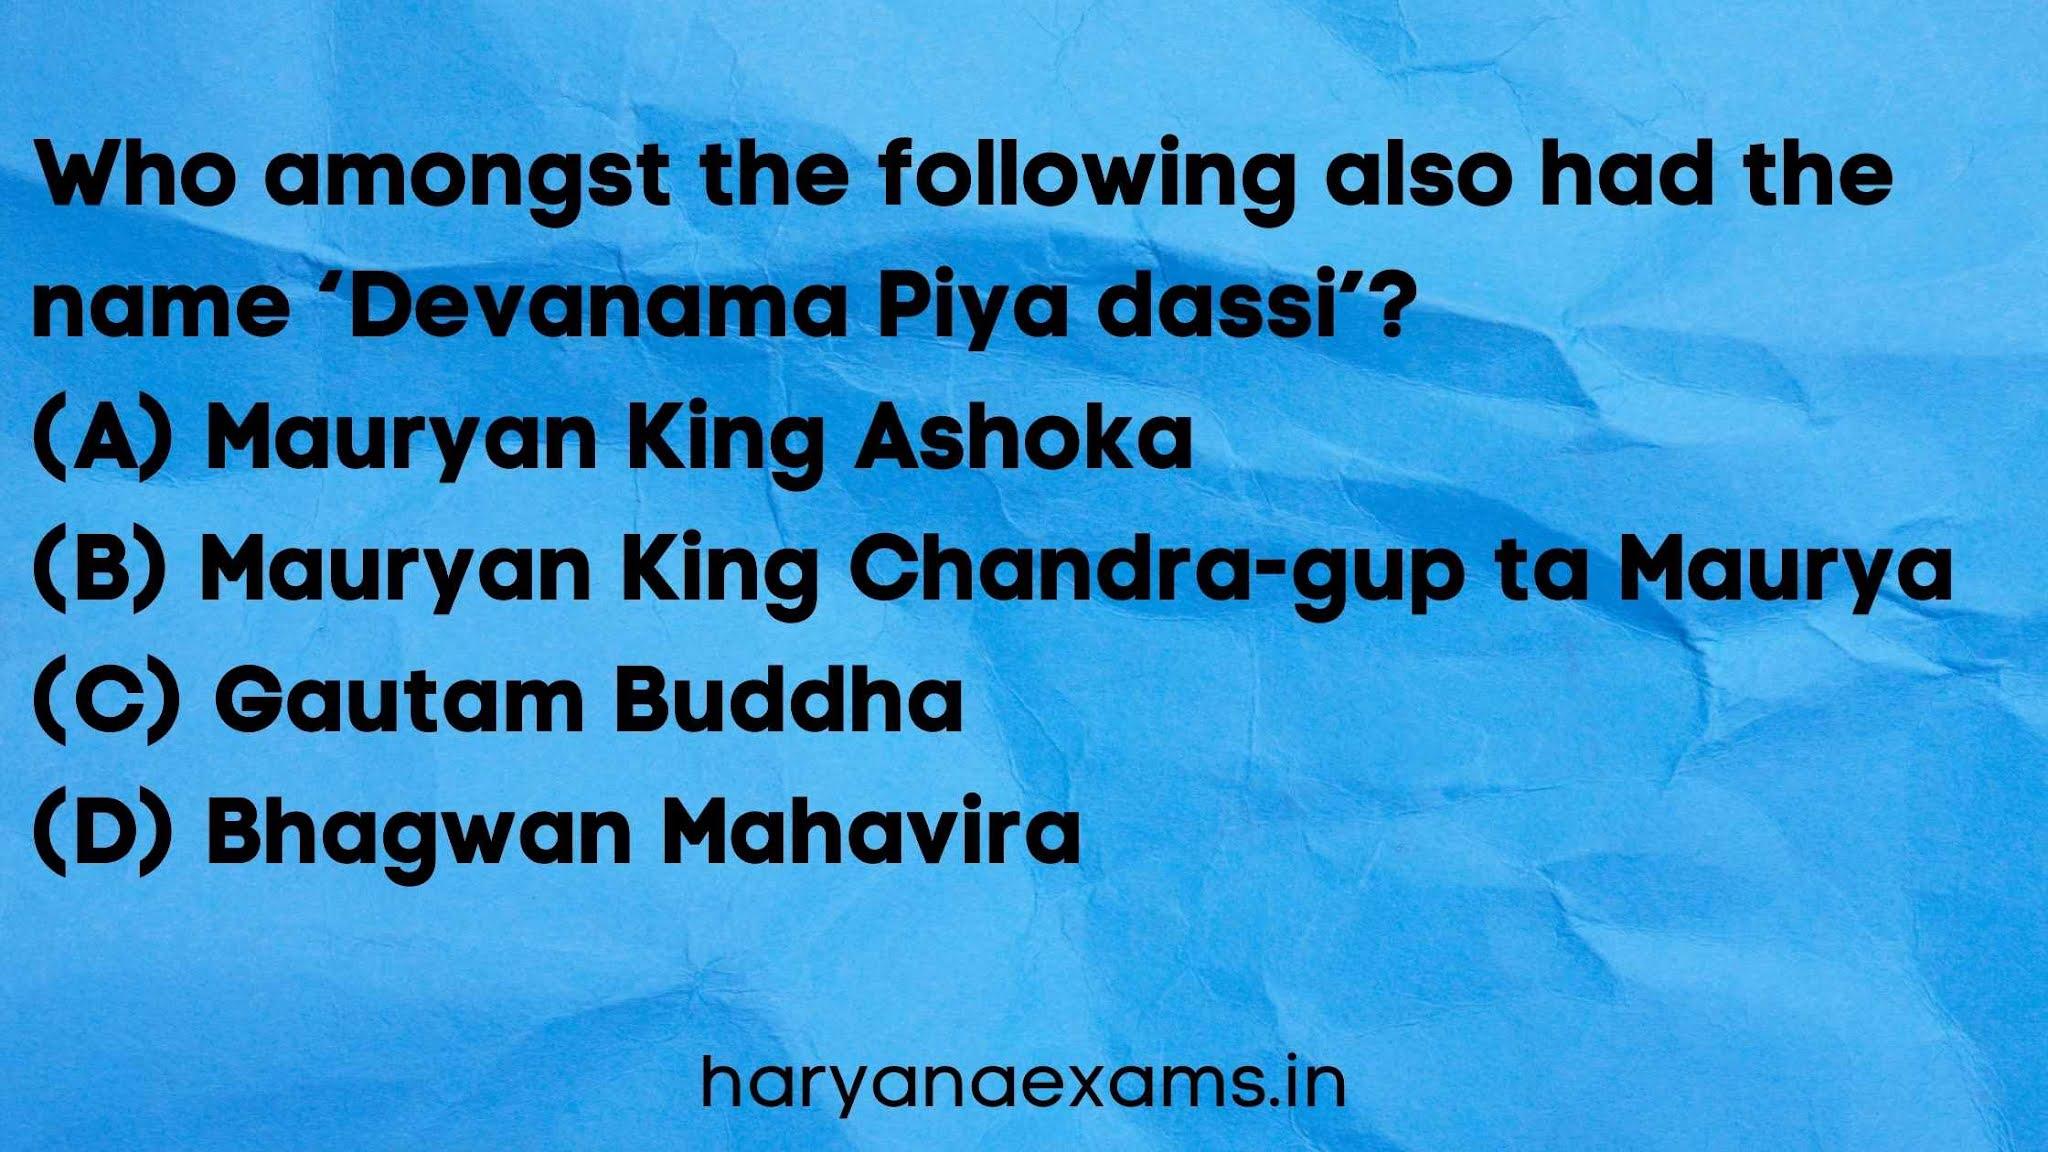 Who amongst the following also had the name 'Devanama Piya dassi'?   (A) Mauryan King Ashoka   (B) Mauryan King Chandra-gup ta Maurya   (C) Gautam Buddha   (D) Bhagwan Mahavira